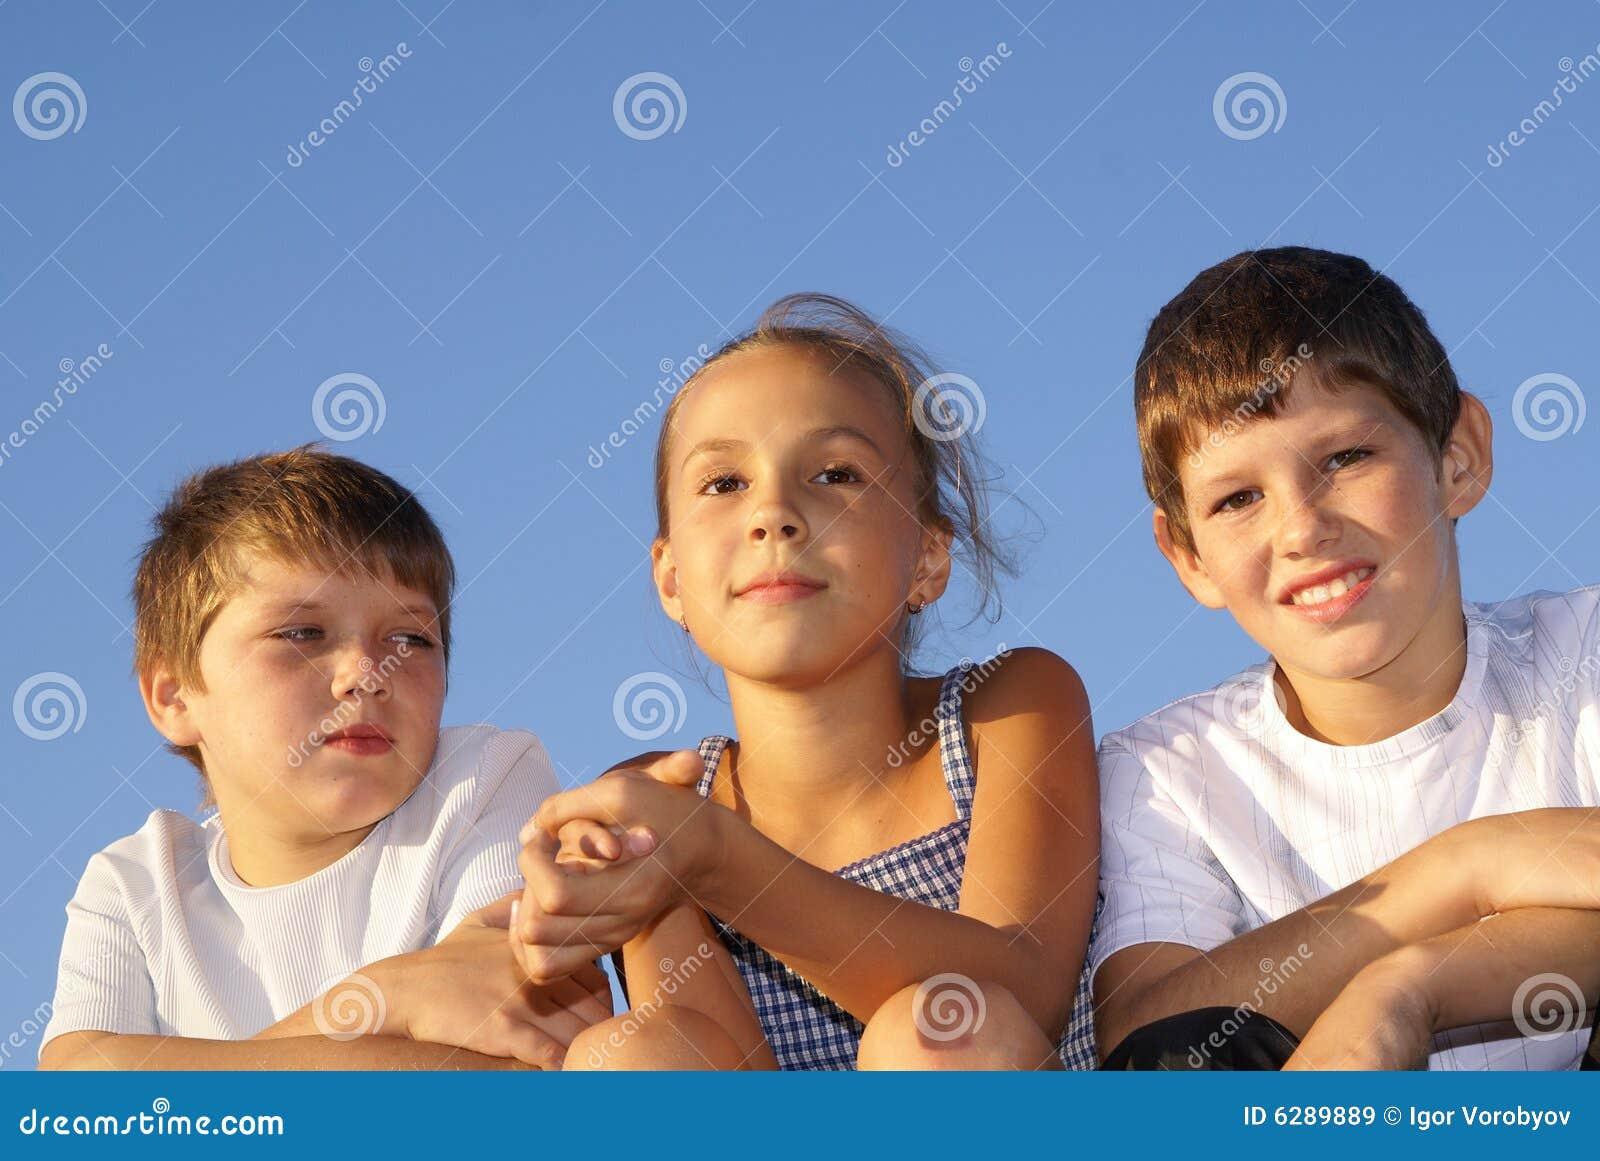 Three preteen friends enjoying summer outdoors on blue sky background.